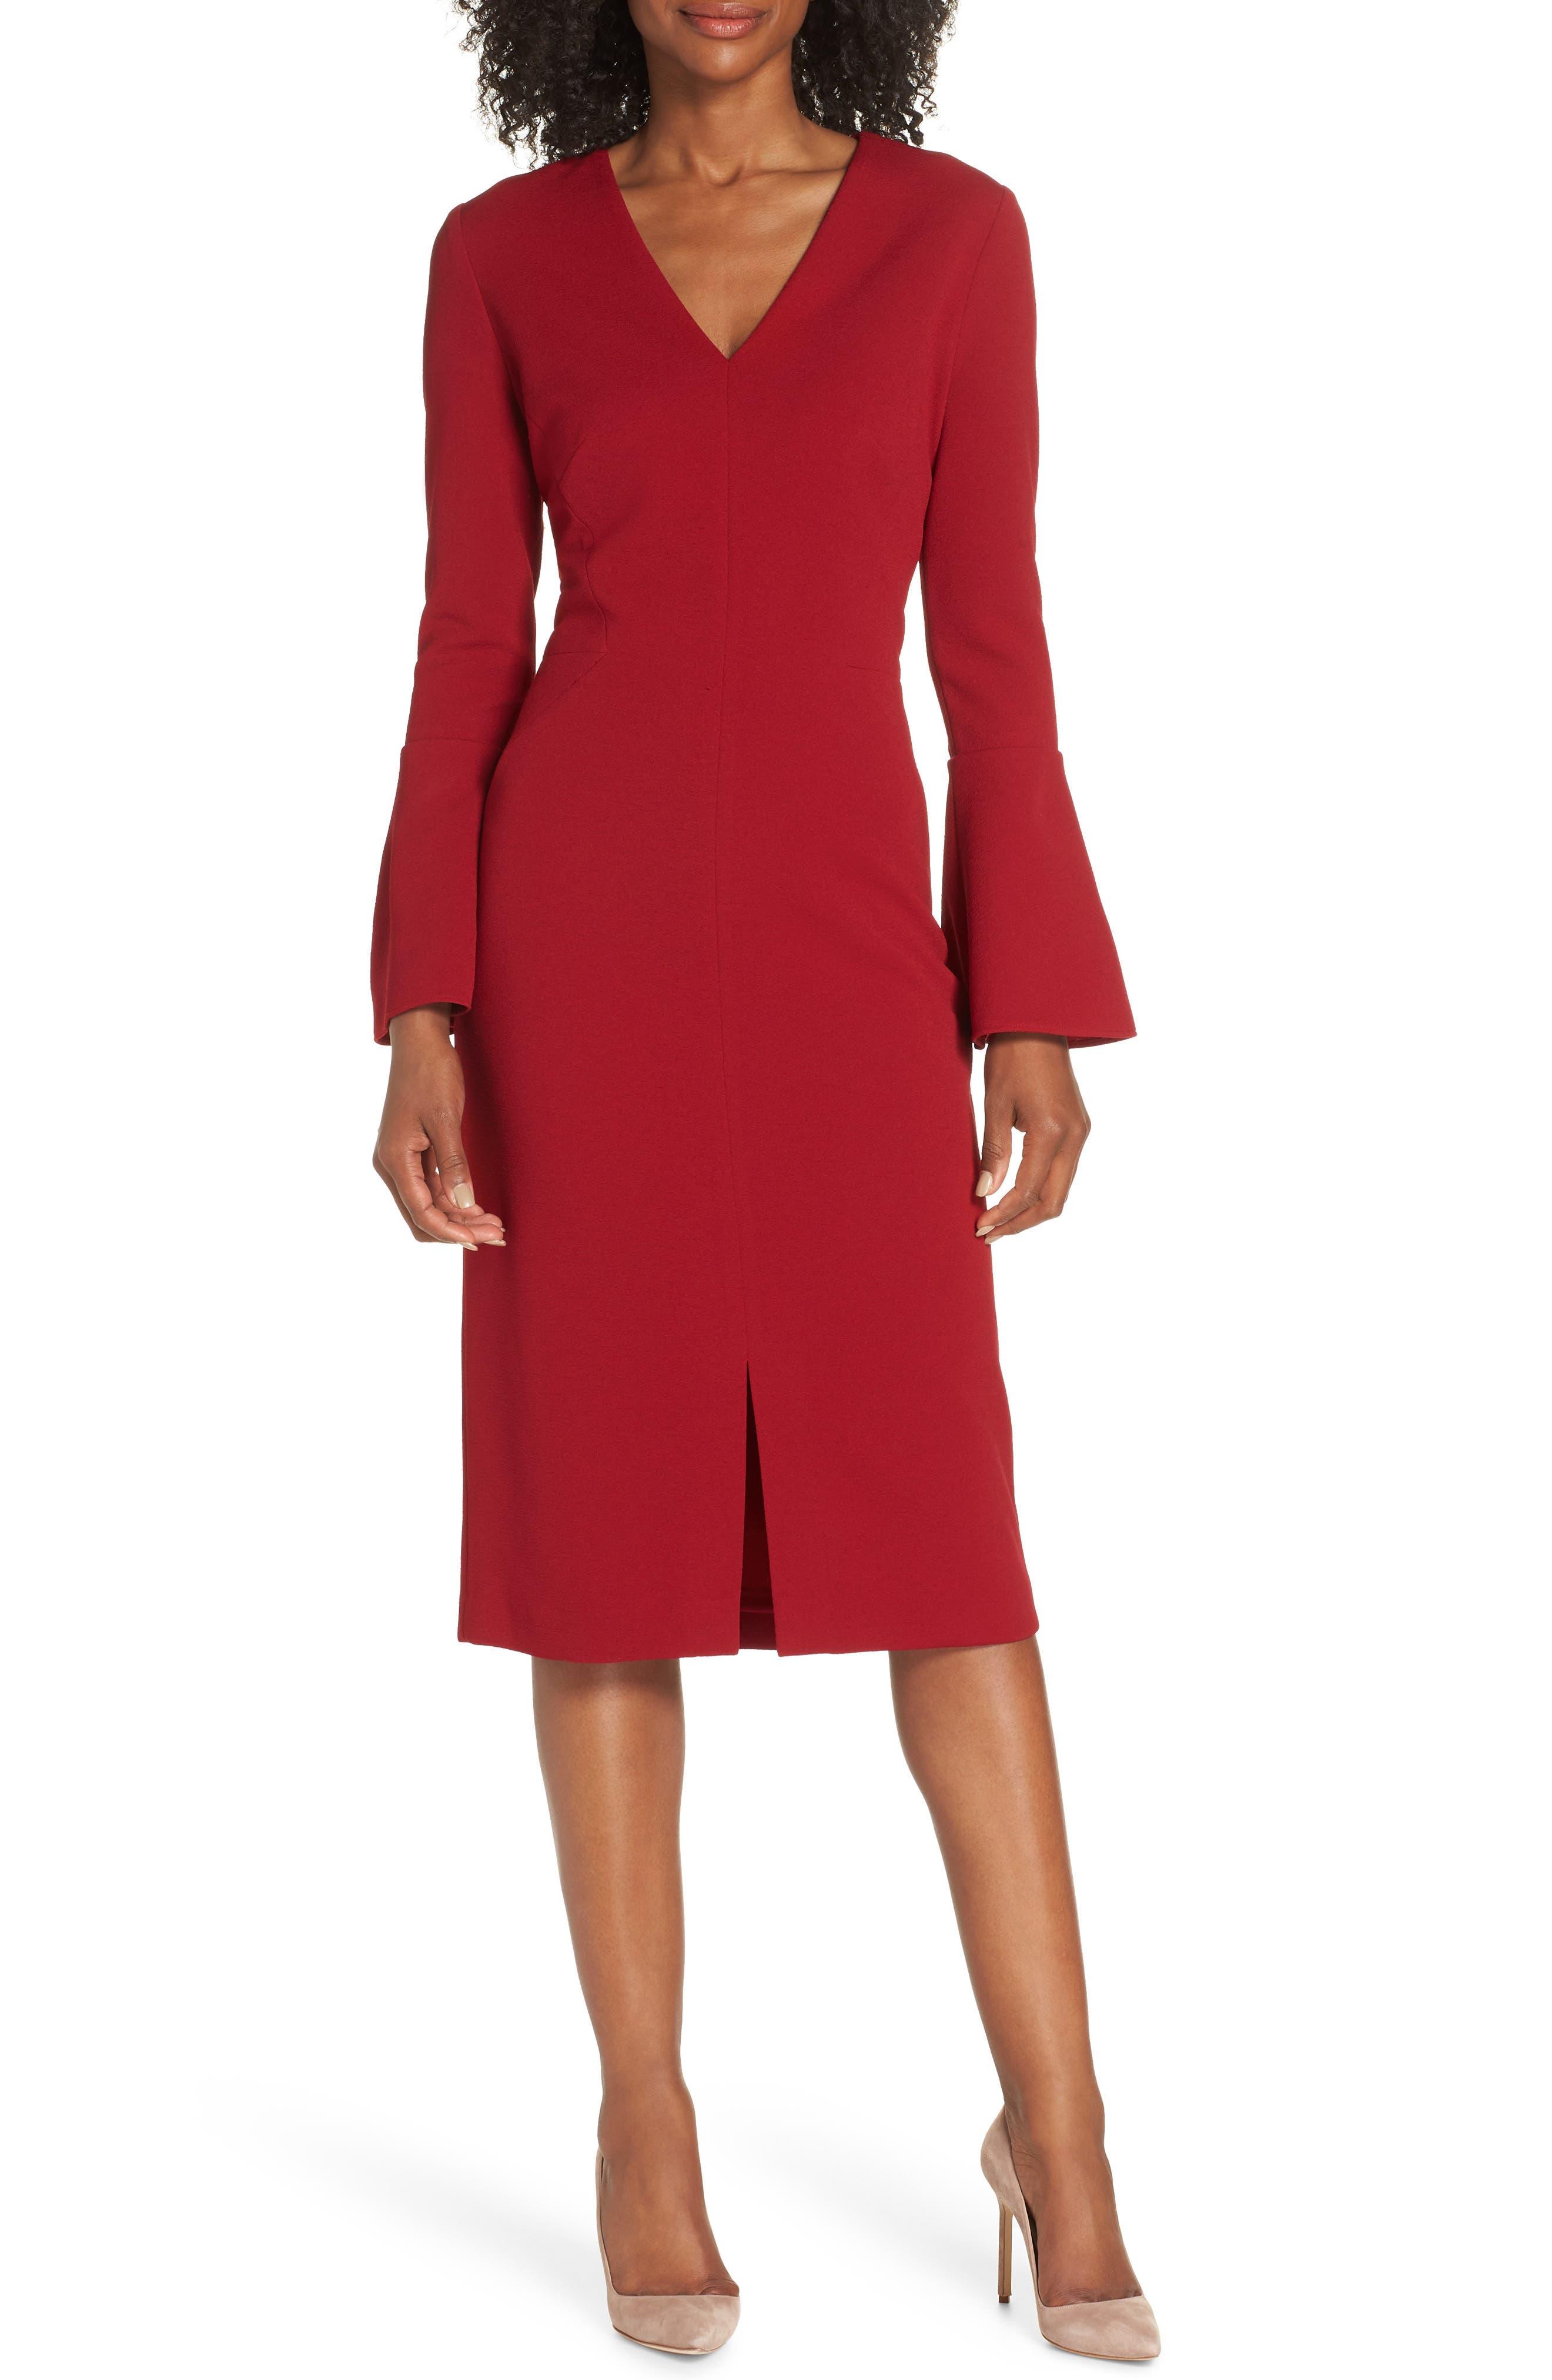 Maggy London Metro Knit Sheath Dress, Red